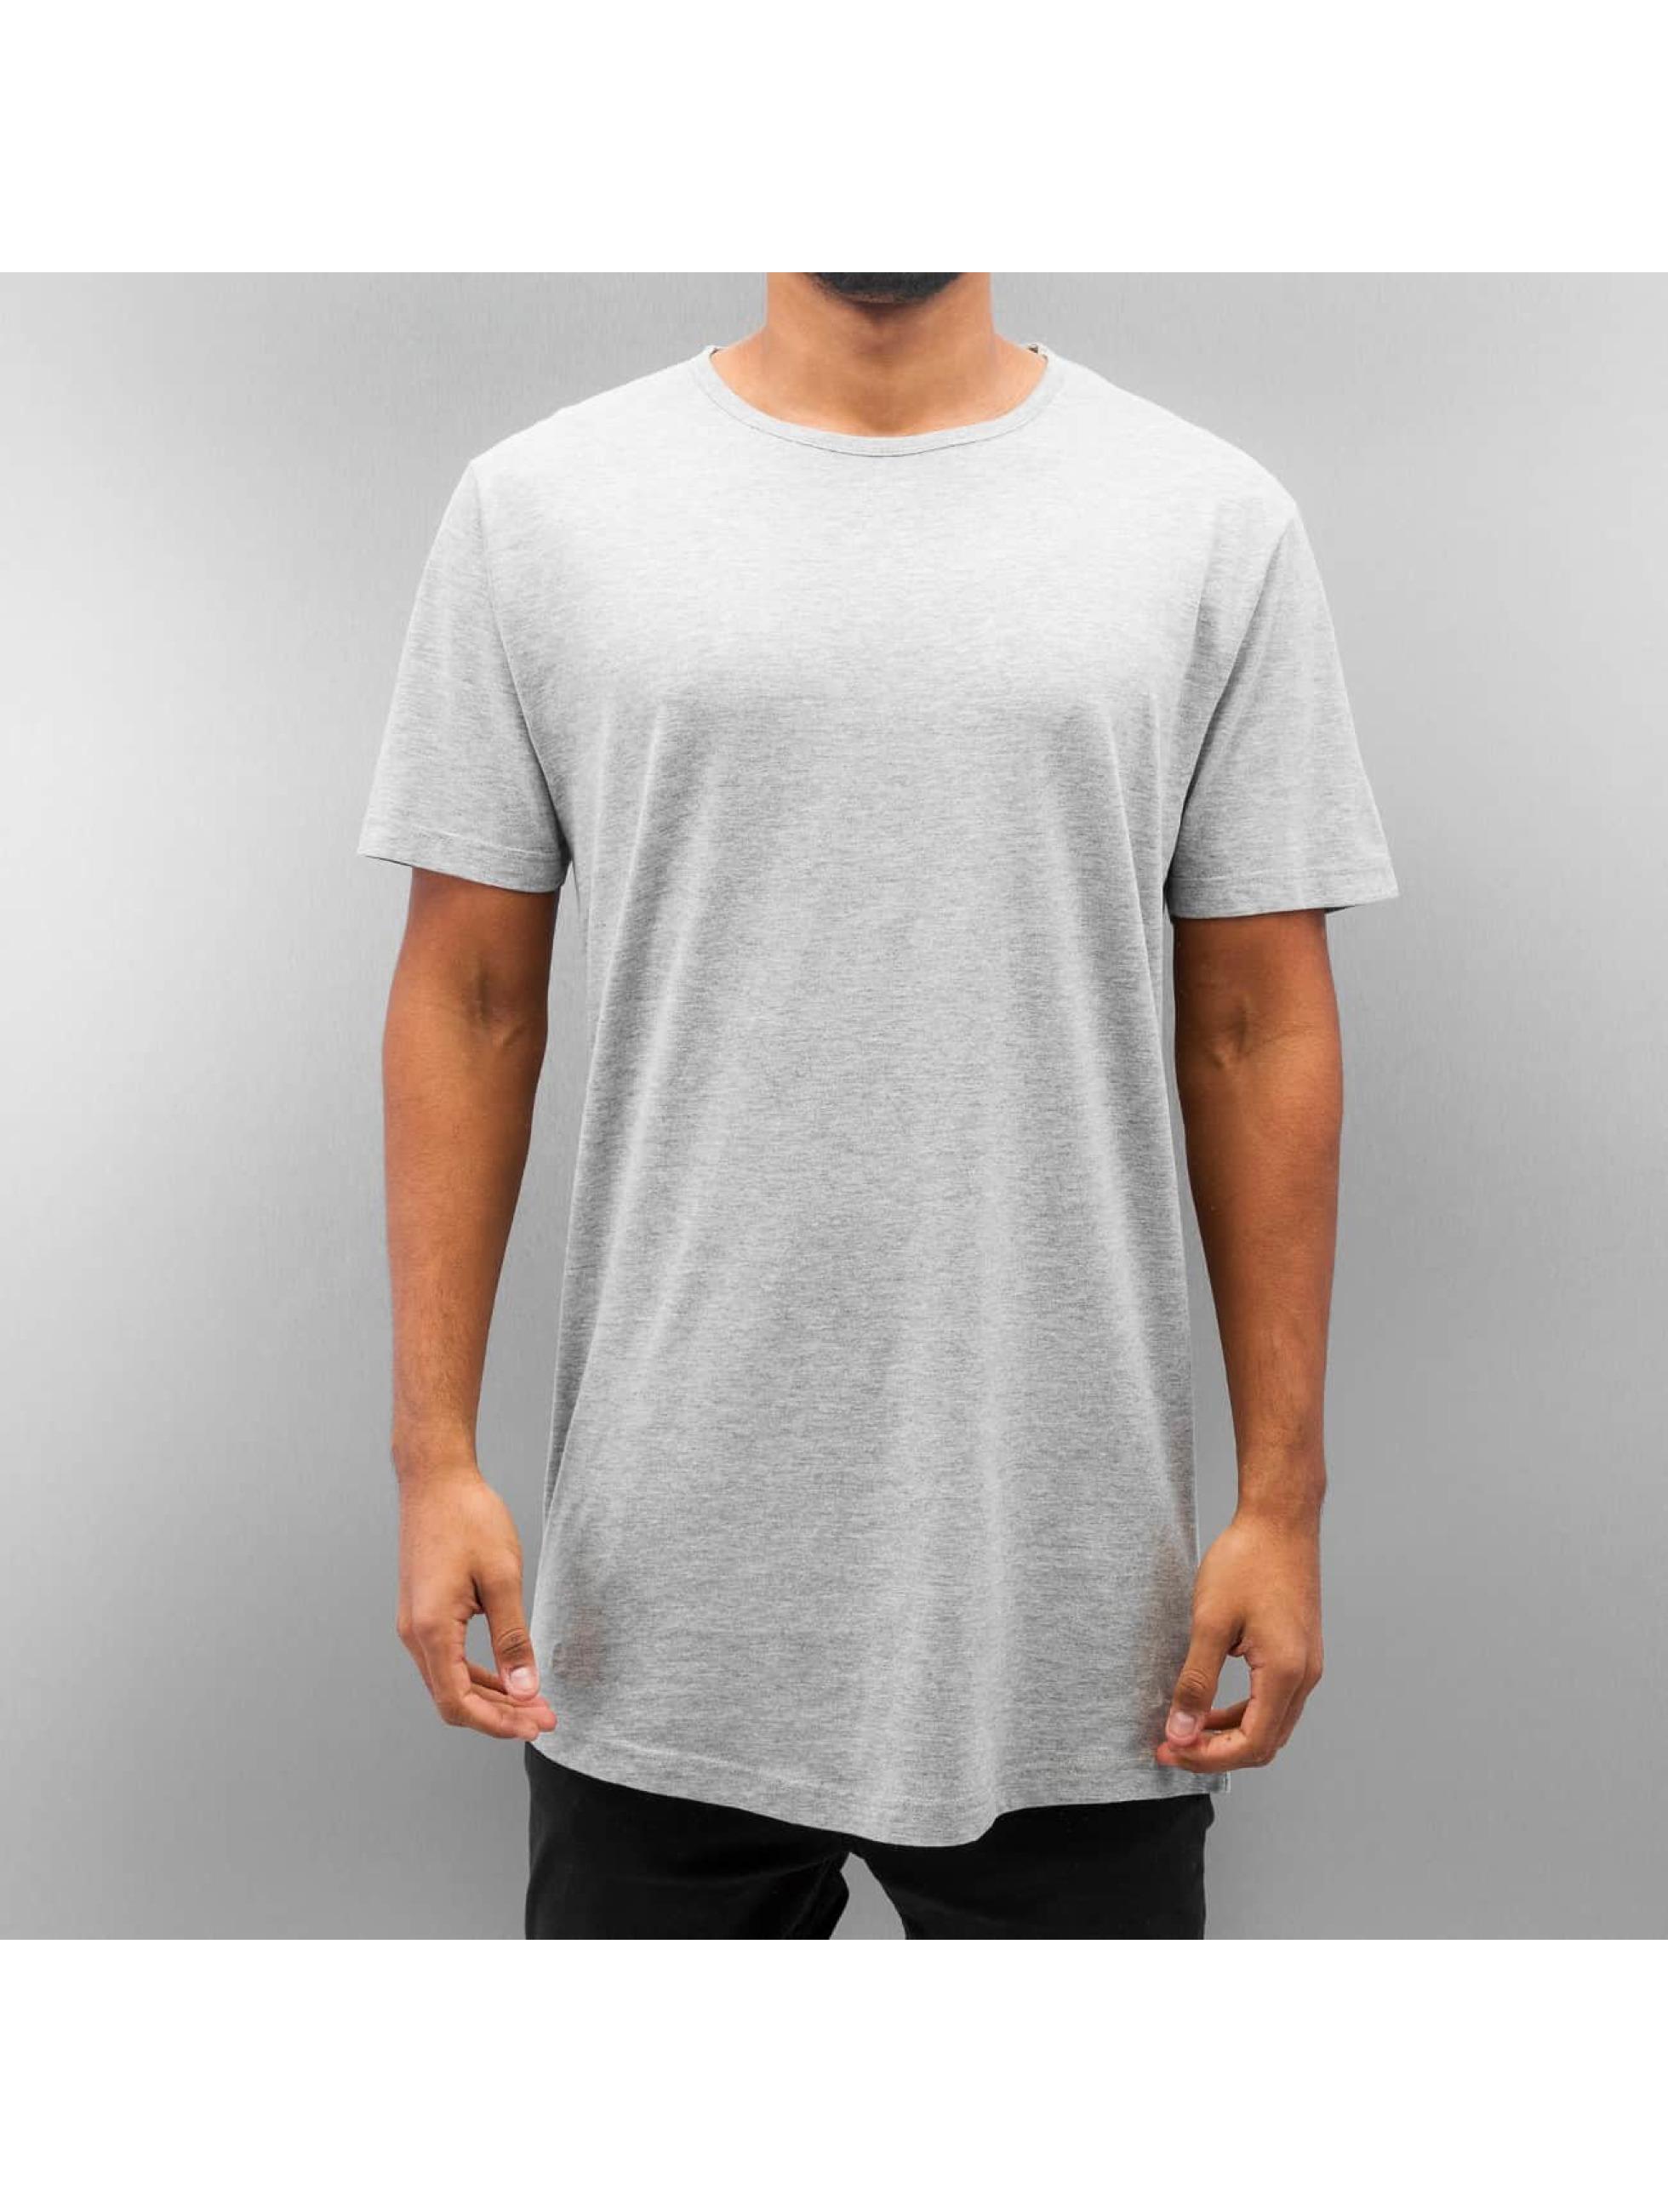 Urban Classics T-Shirt Peached Shaped Long gris